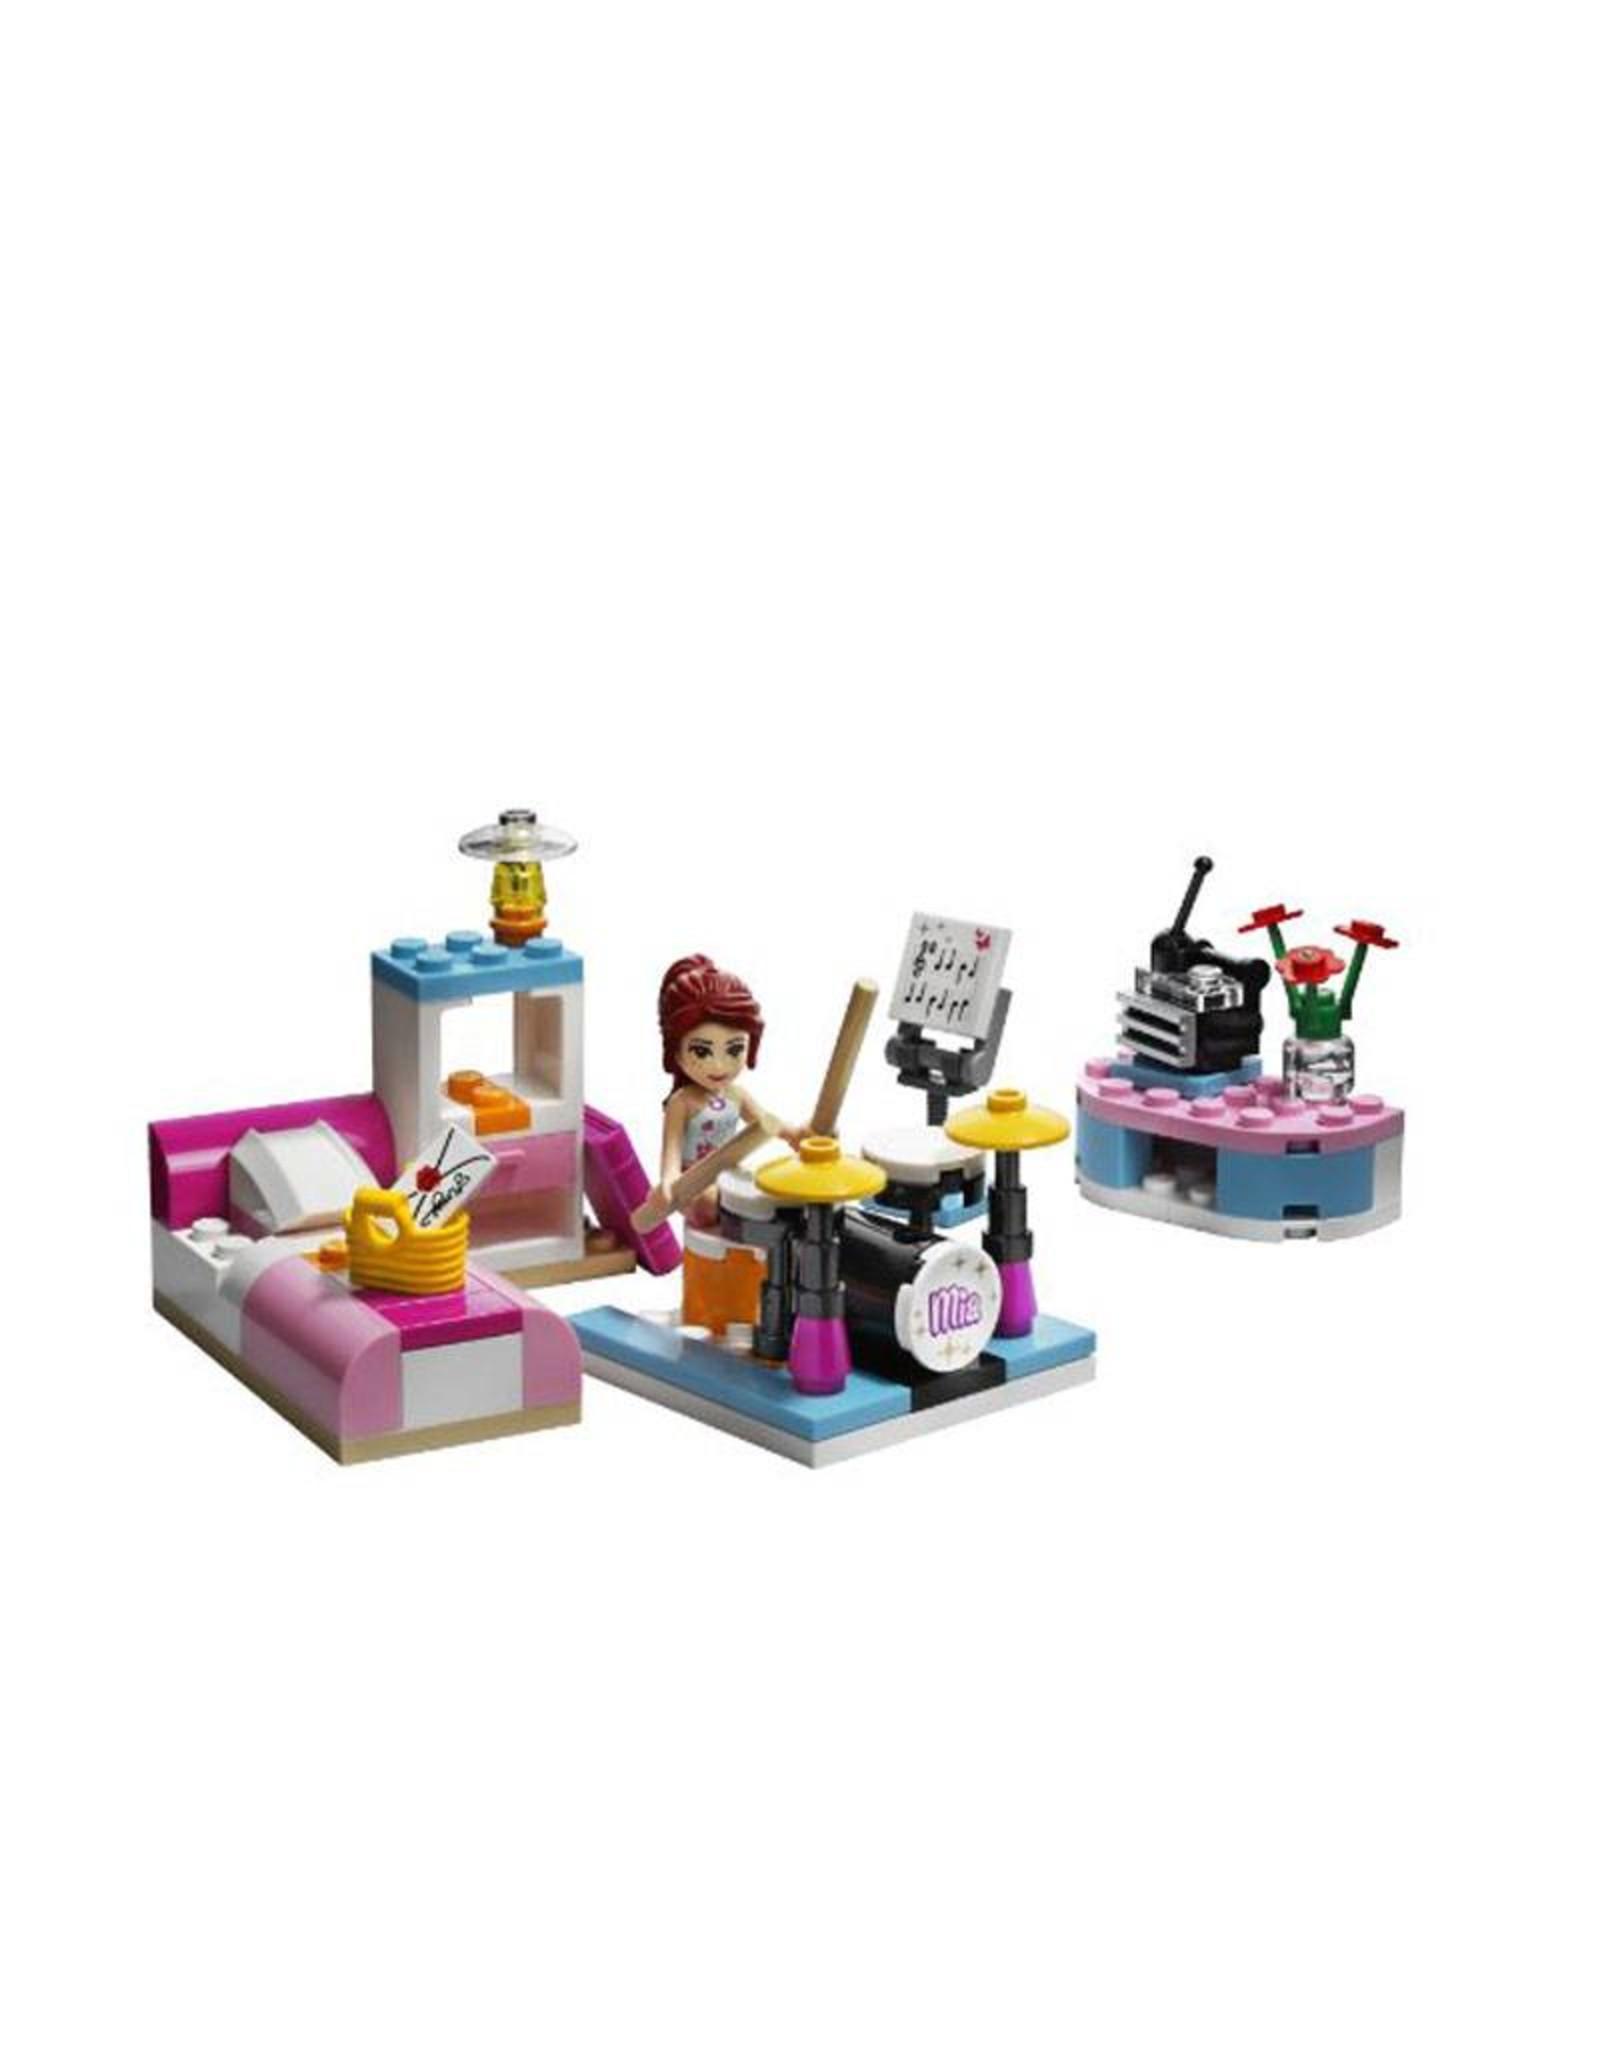 LEGO LEGO 3939 Mia's Slaapkamer FRIENDS